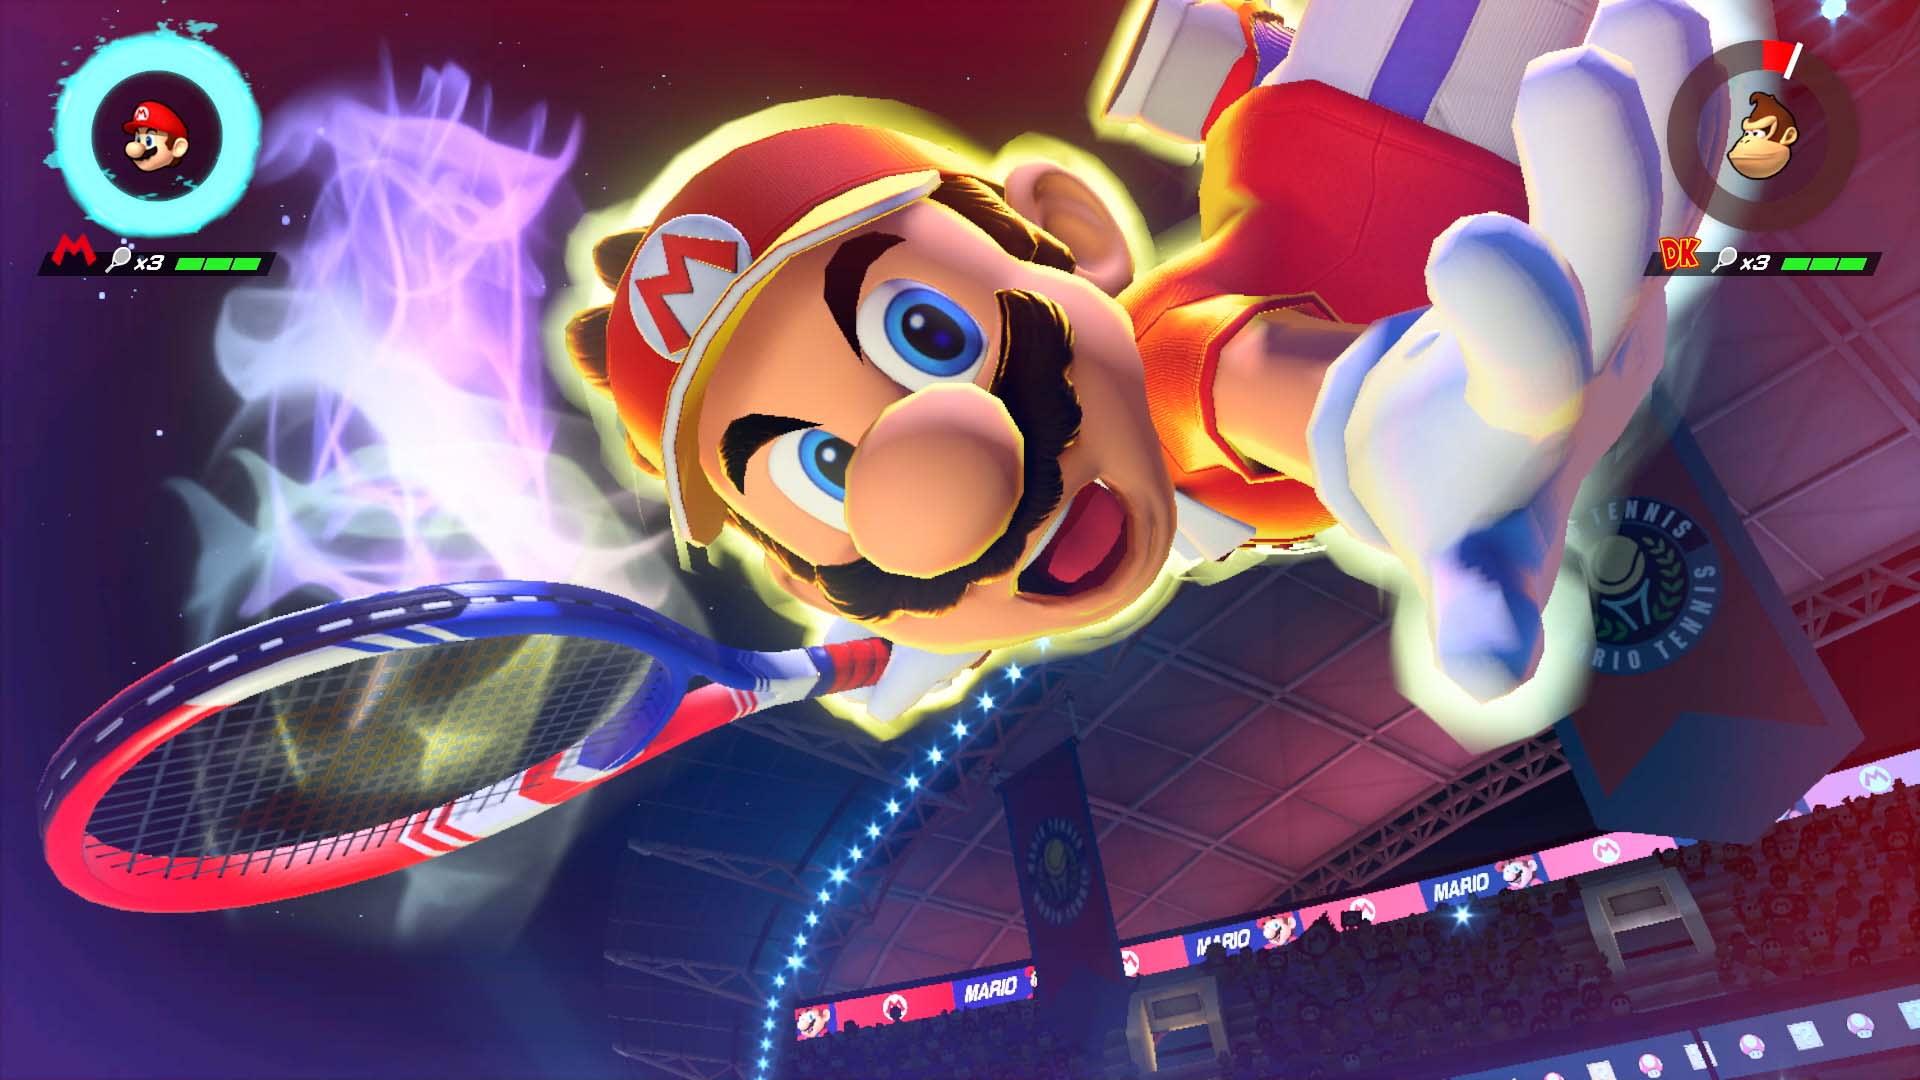 0a6a22fbc55ef Nintendo s  Mario Tennis Aces  combines charm with surprising depth